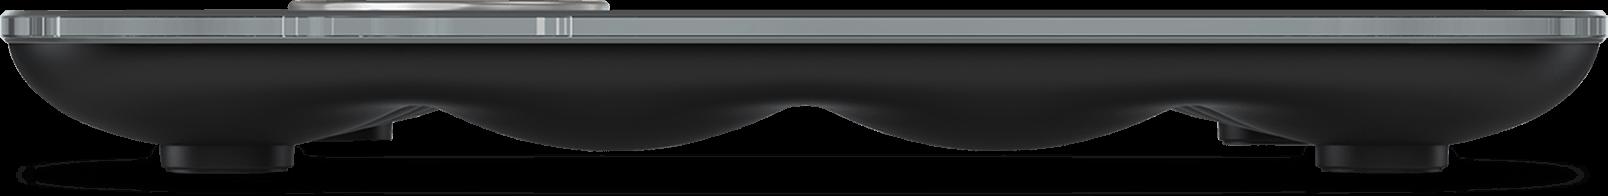 Fitbit Aria Wifi Smart Scale Black